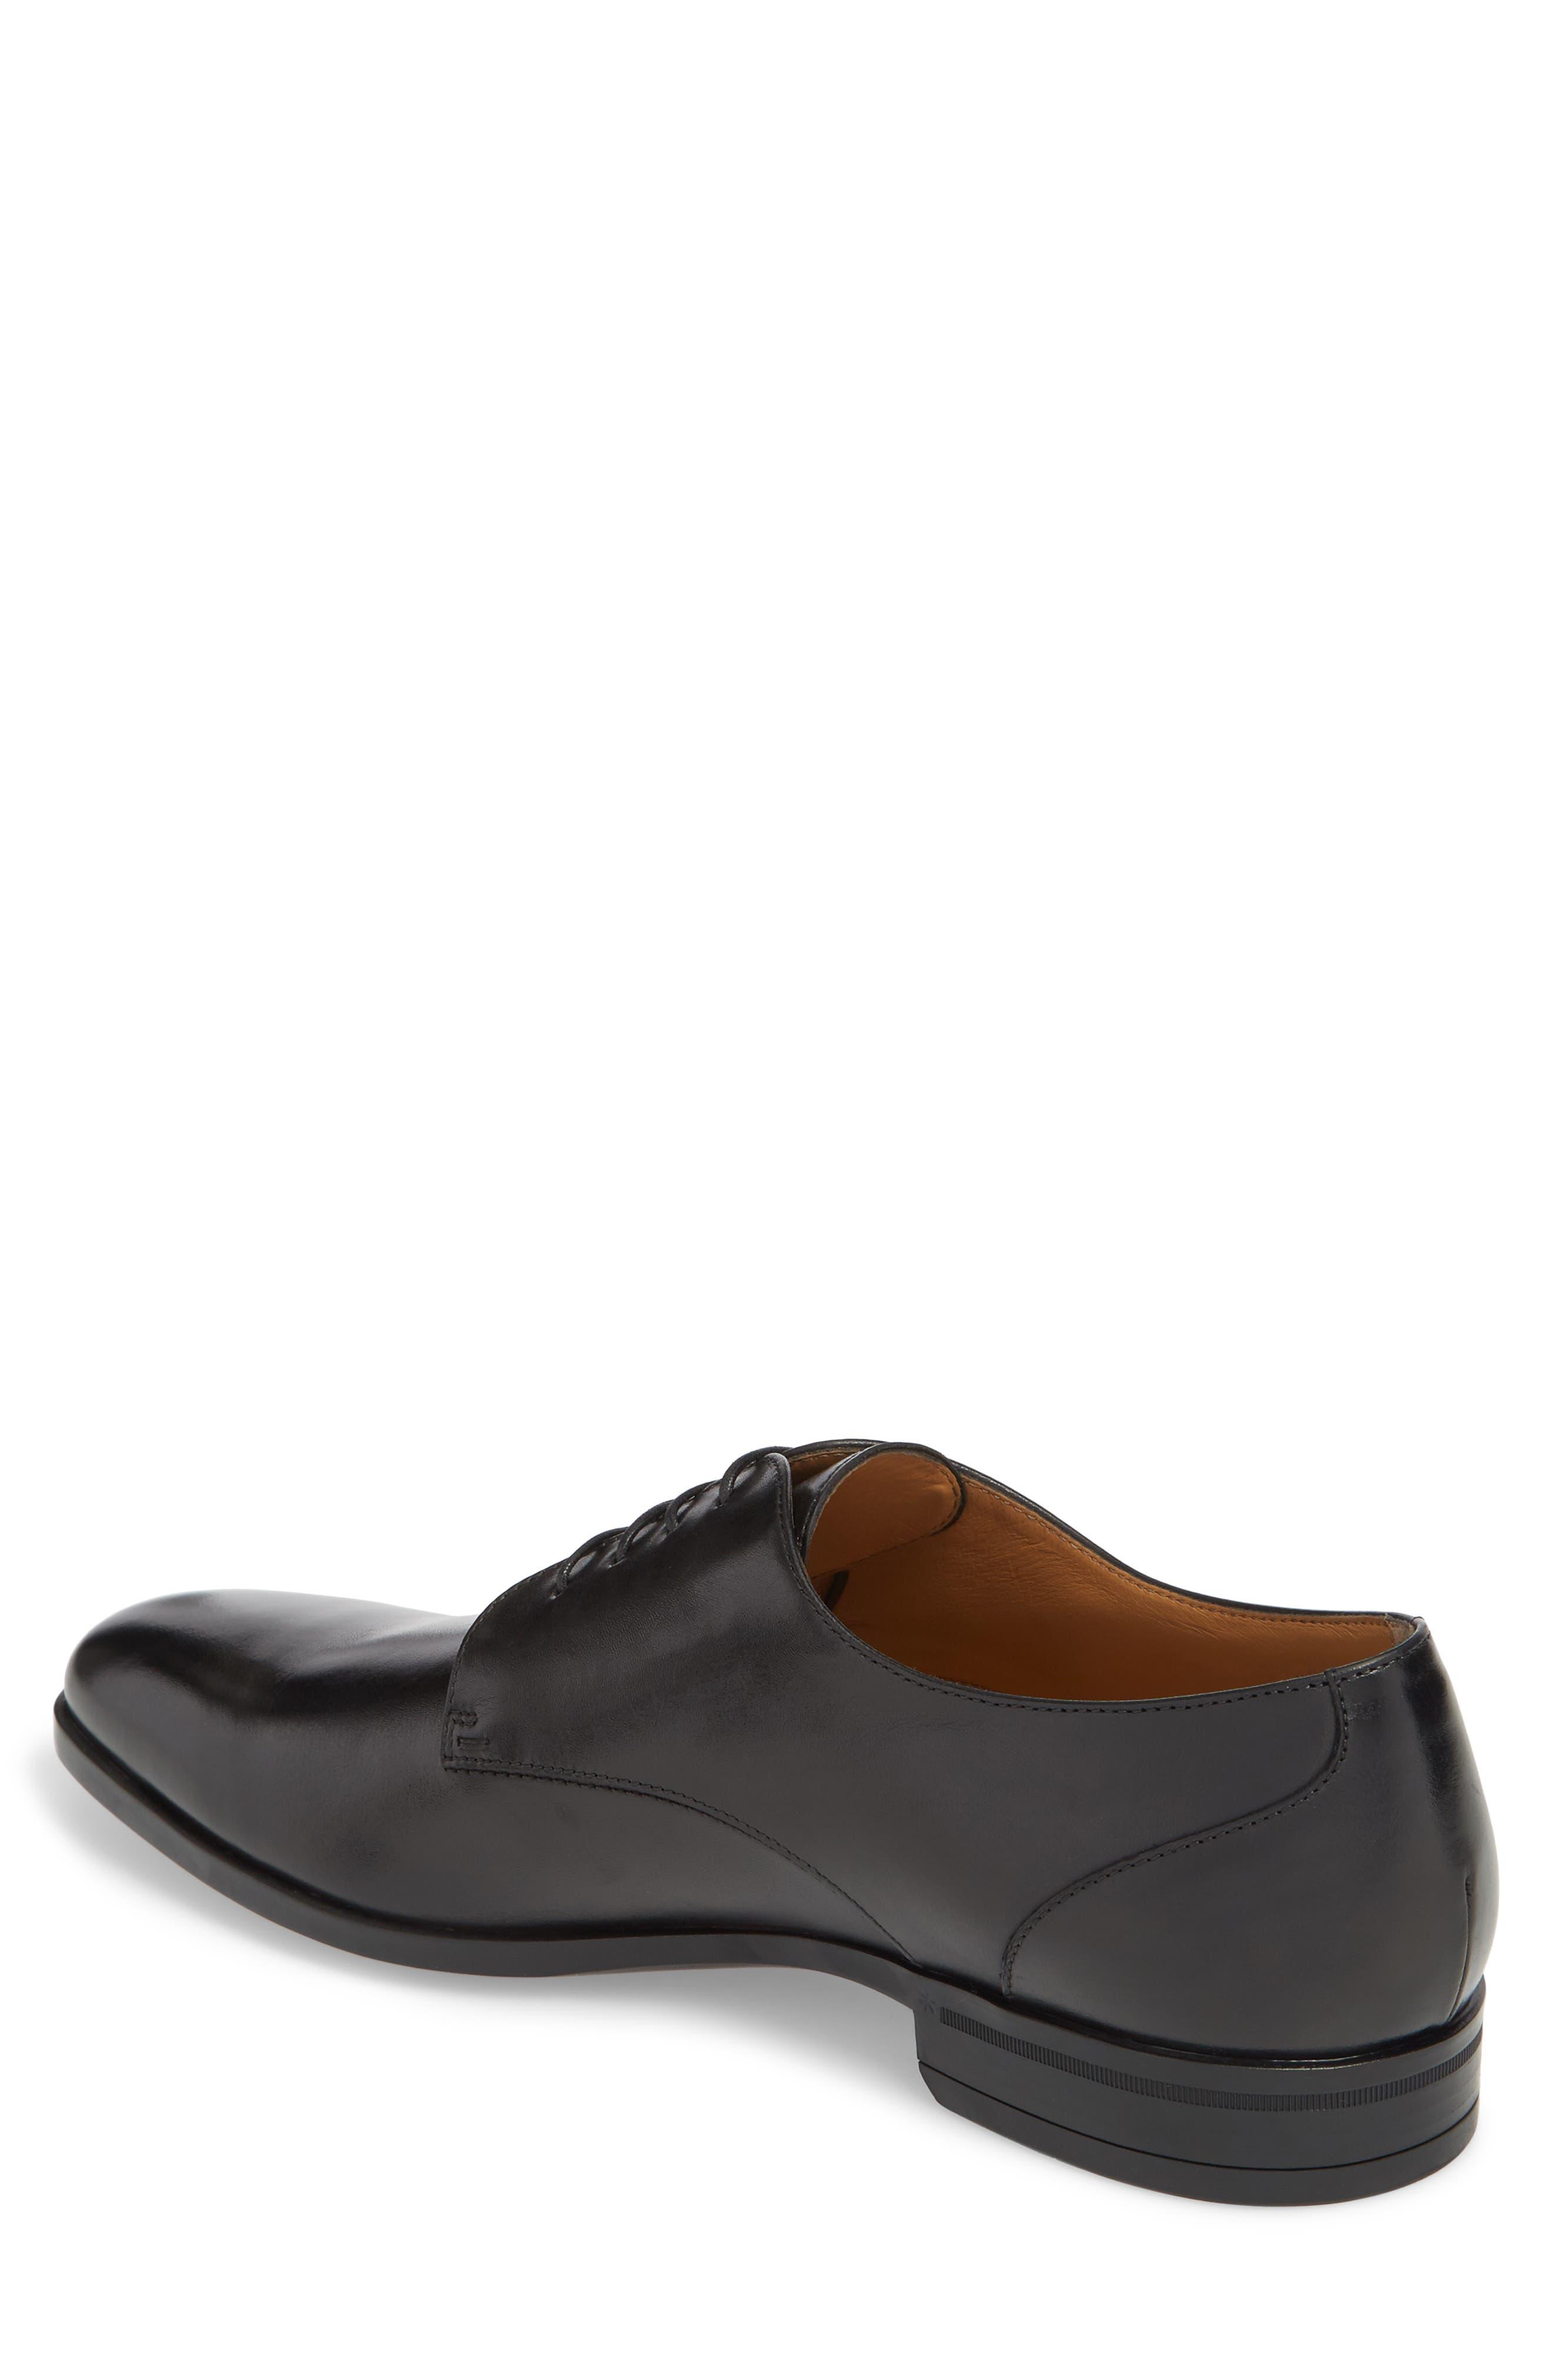 Portland Plain Toe Derby,                             Alternate thumbnail 2, color,                             Black Leather